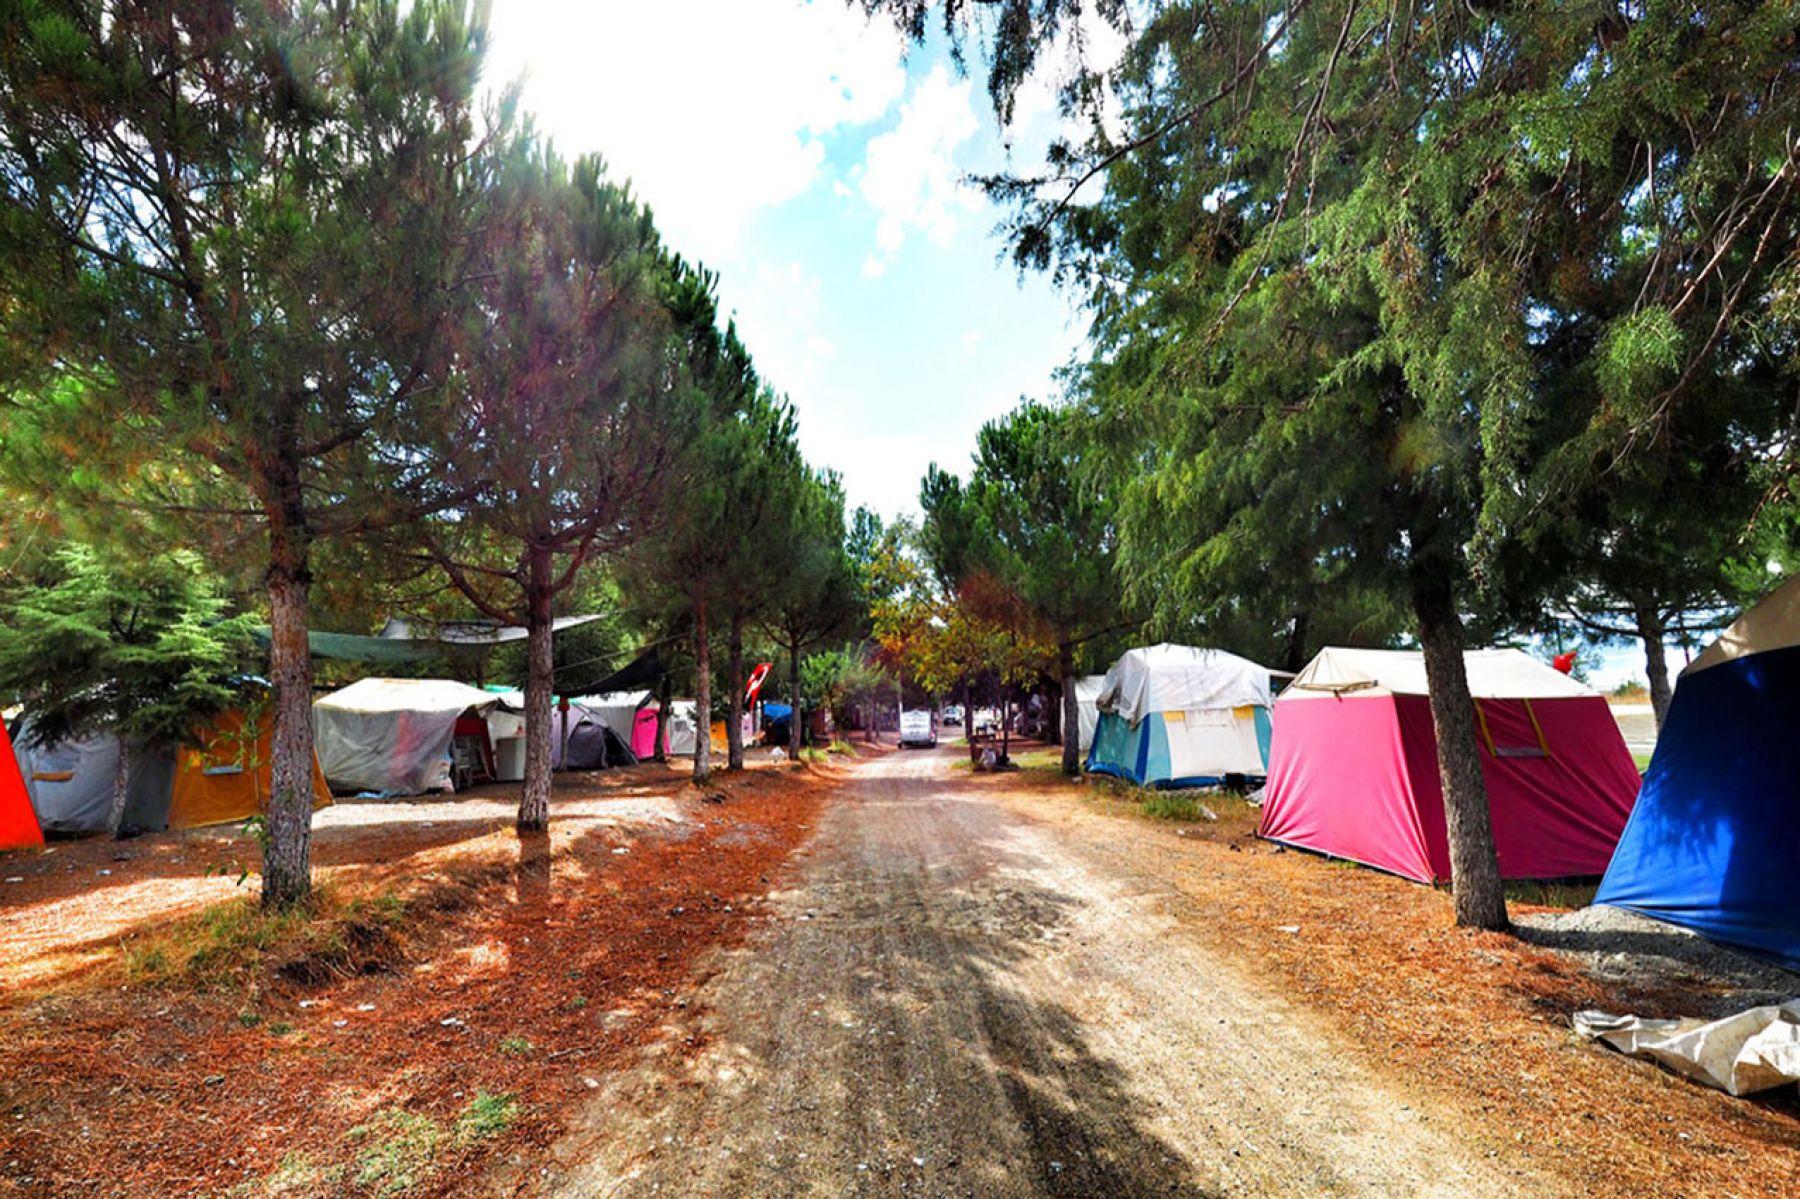 Ünye Çınarsuyu Kamp Alanı